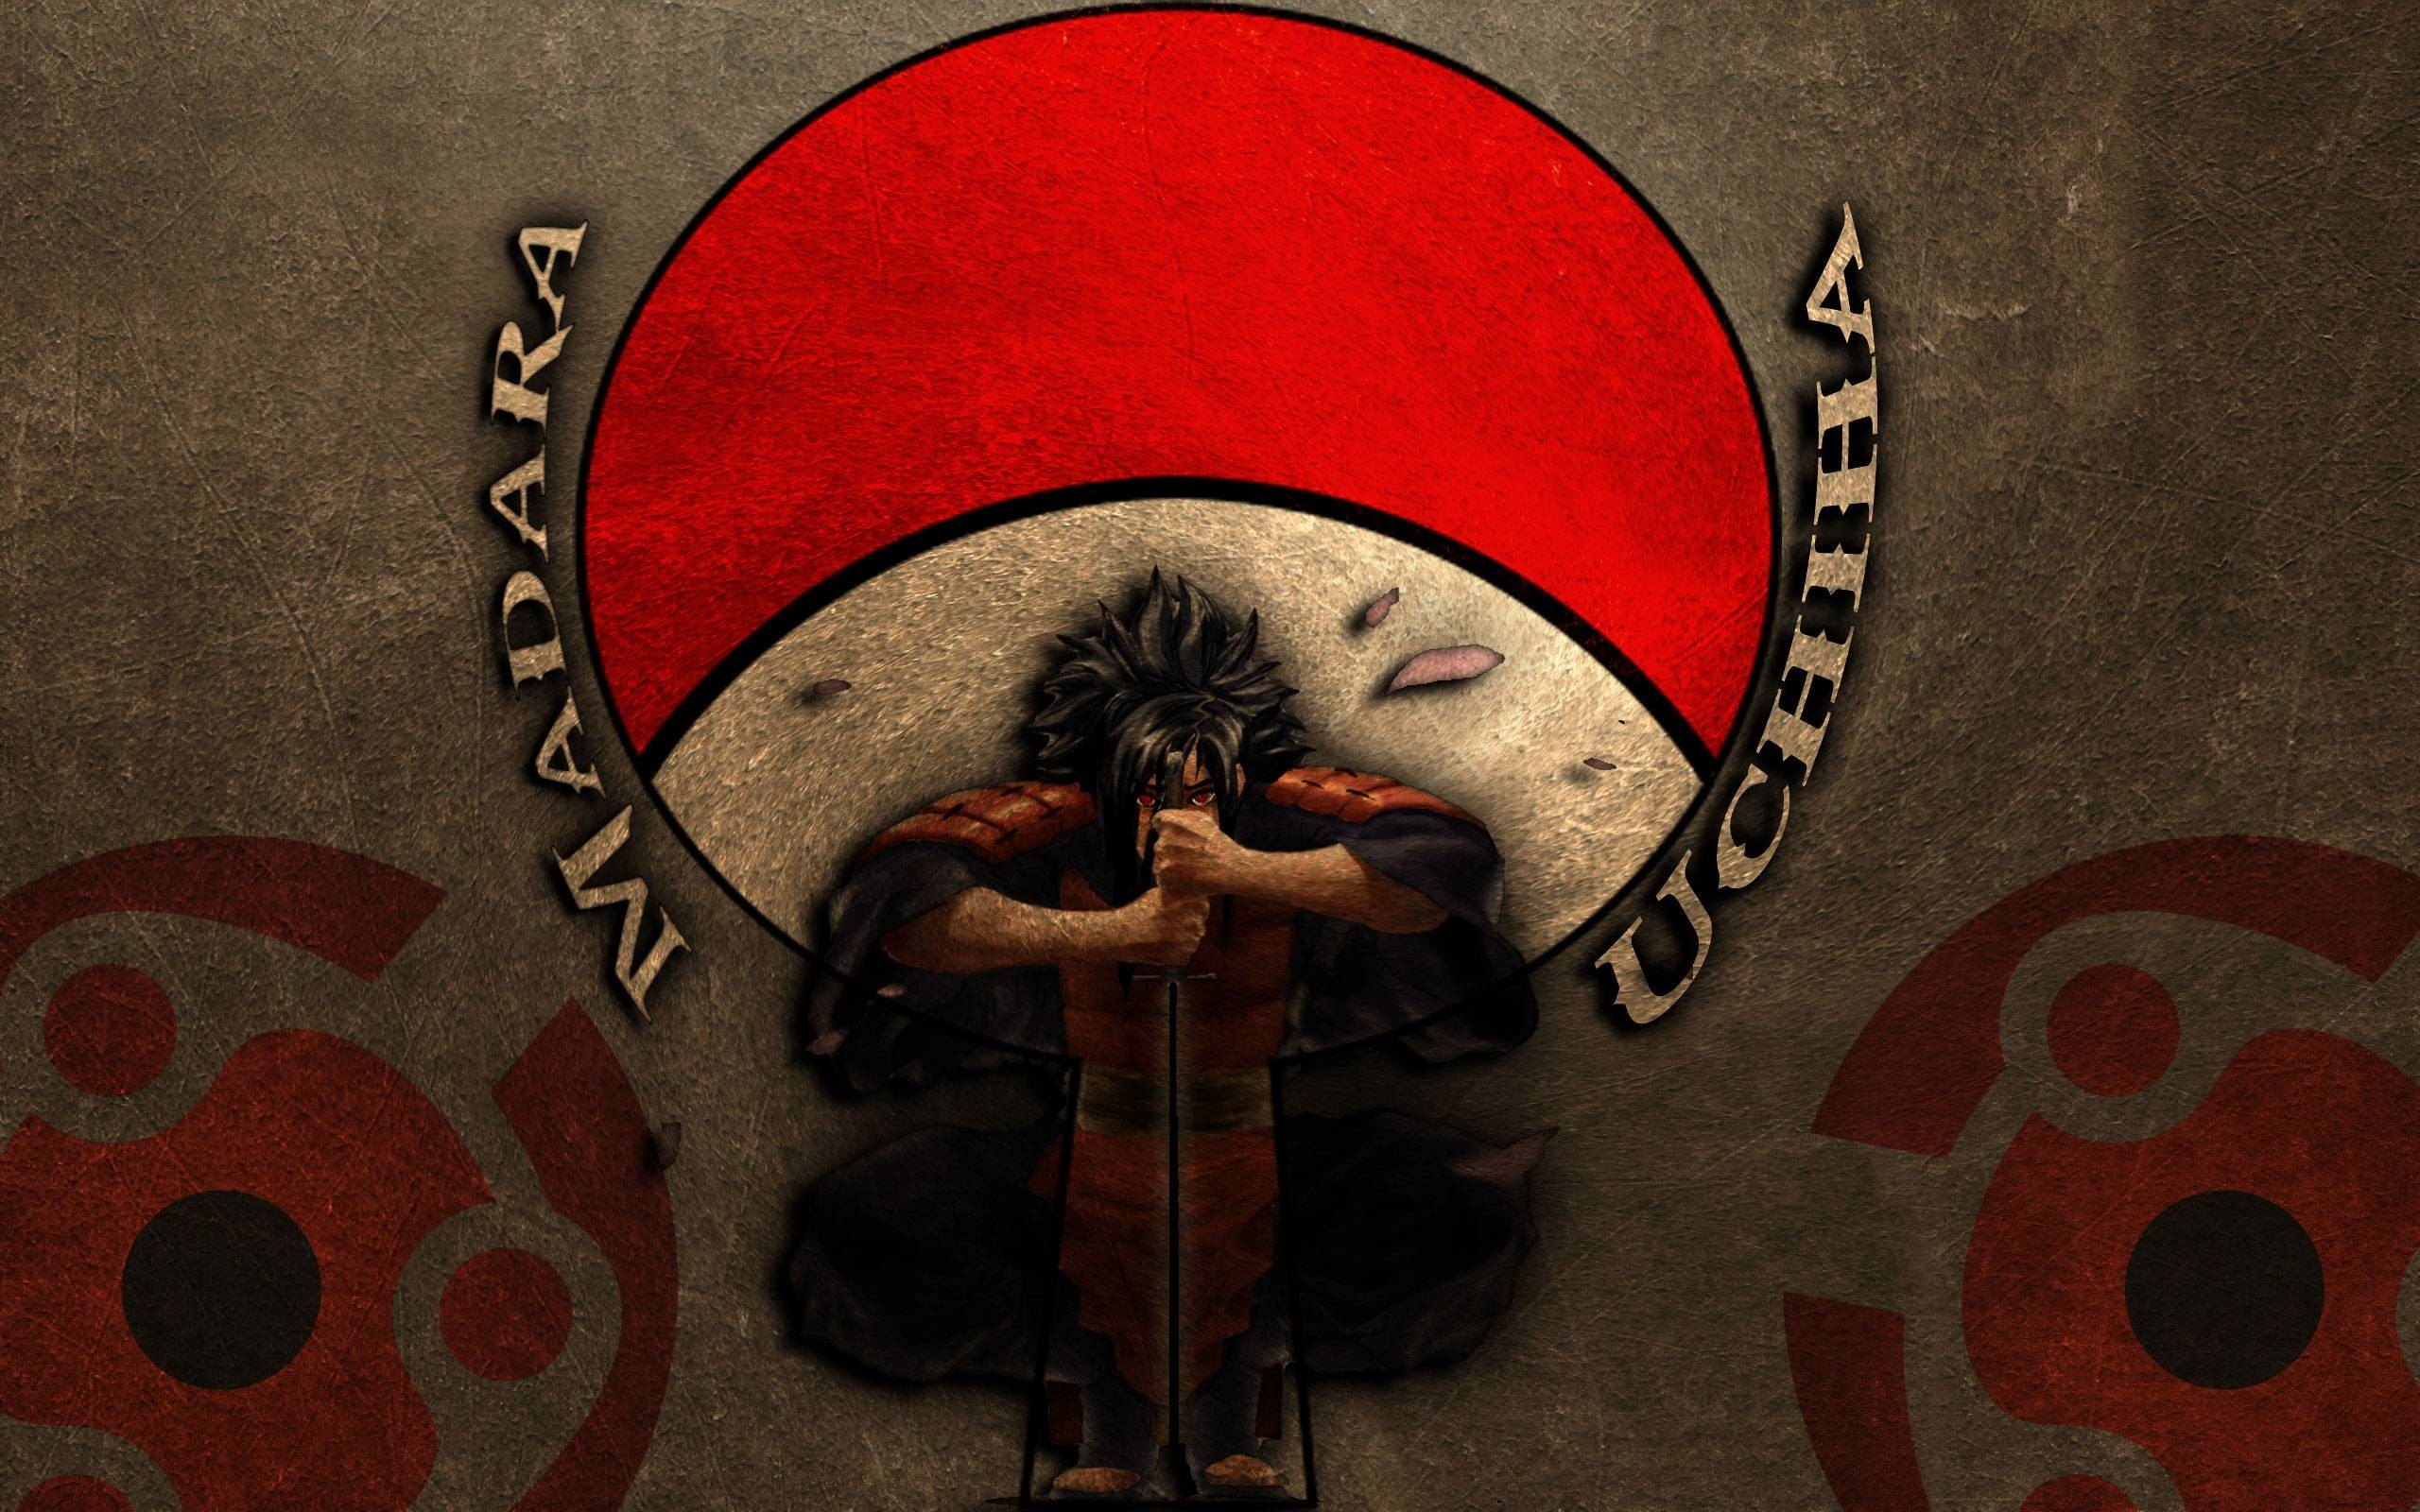 Uchiha Clan Wallpaper 258 Wallpapers | Wallver.